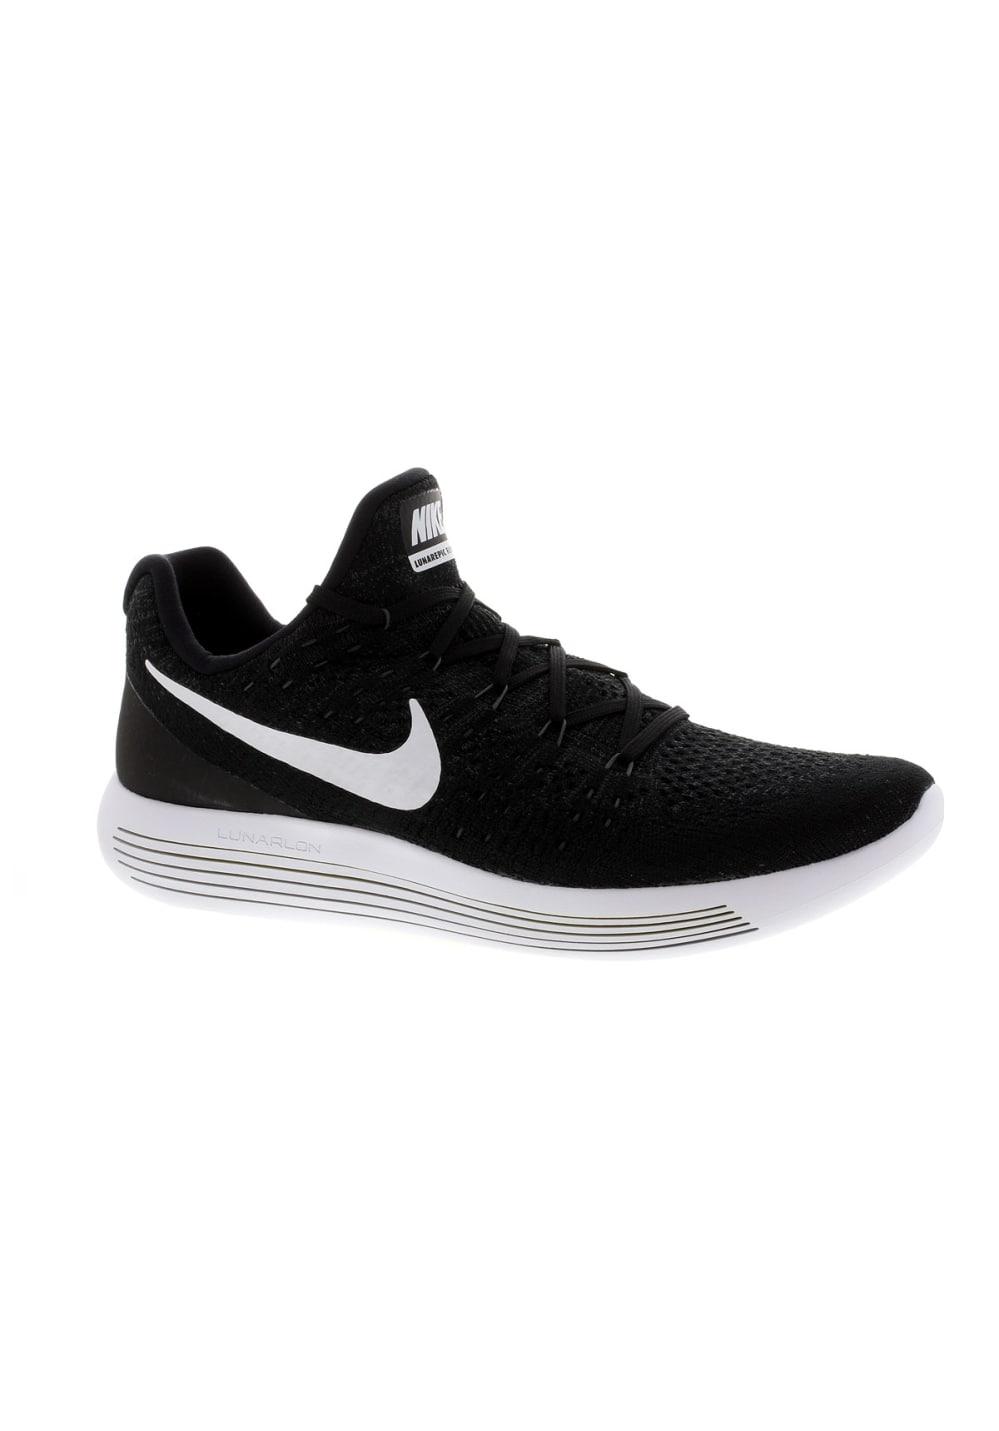 sale retailer ca1dd 11624 Nike Lunarepic Low Flyknit 2 - Running shoes for Men - Black